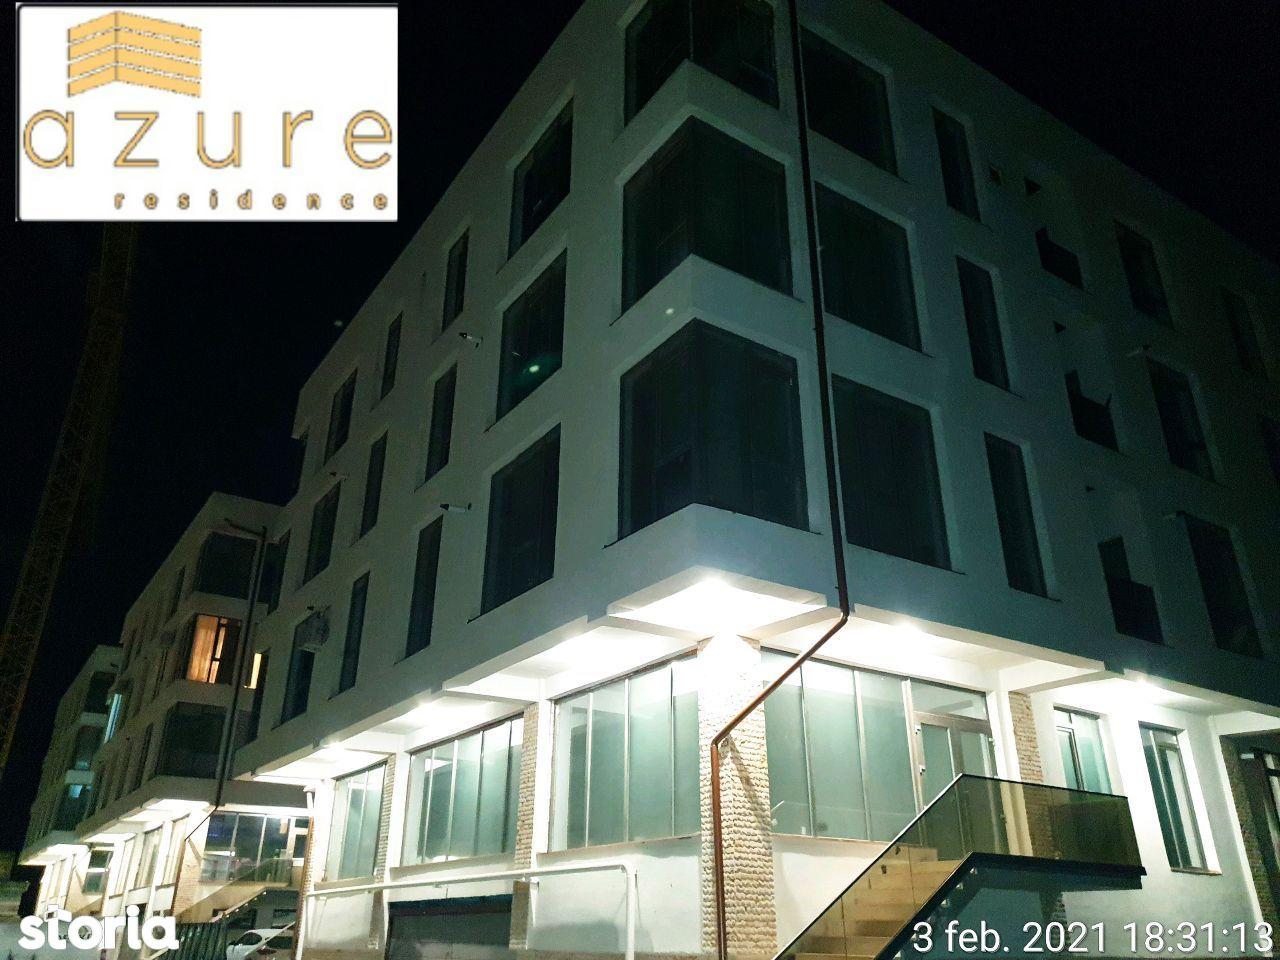 Apartament 3 camere FINISAT cu Garaj. Toate utilitatile D Stanca Lidl